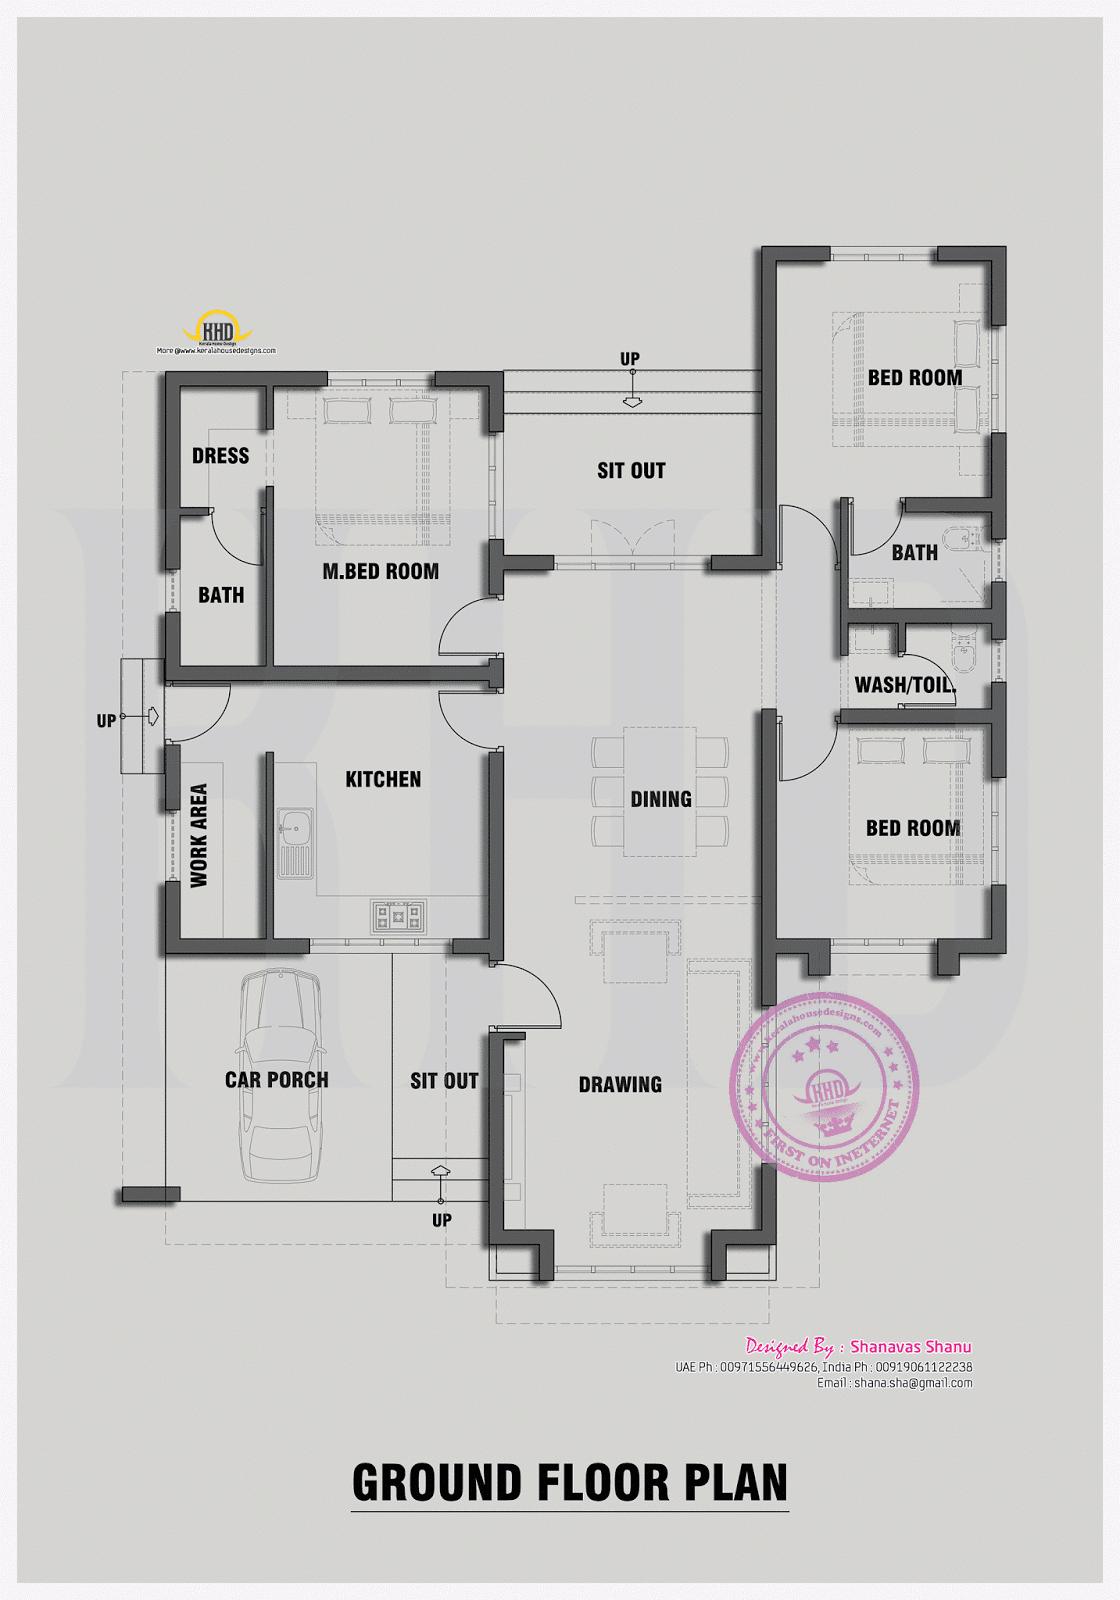 House plan for common man kerala home design and floor plans for Common house plans